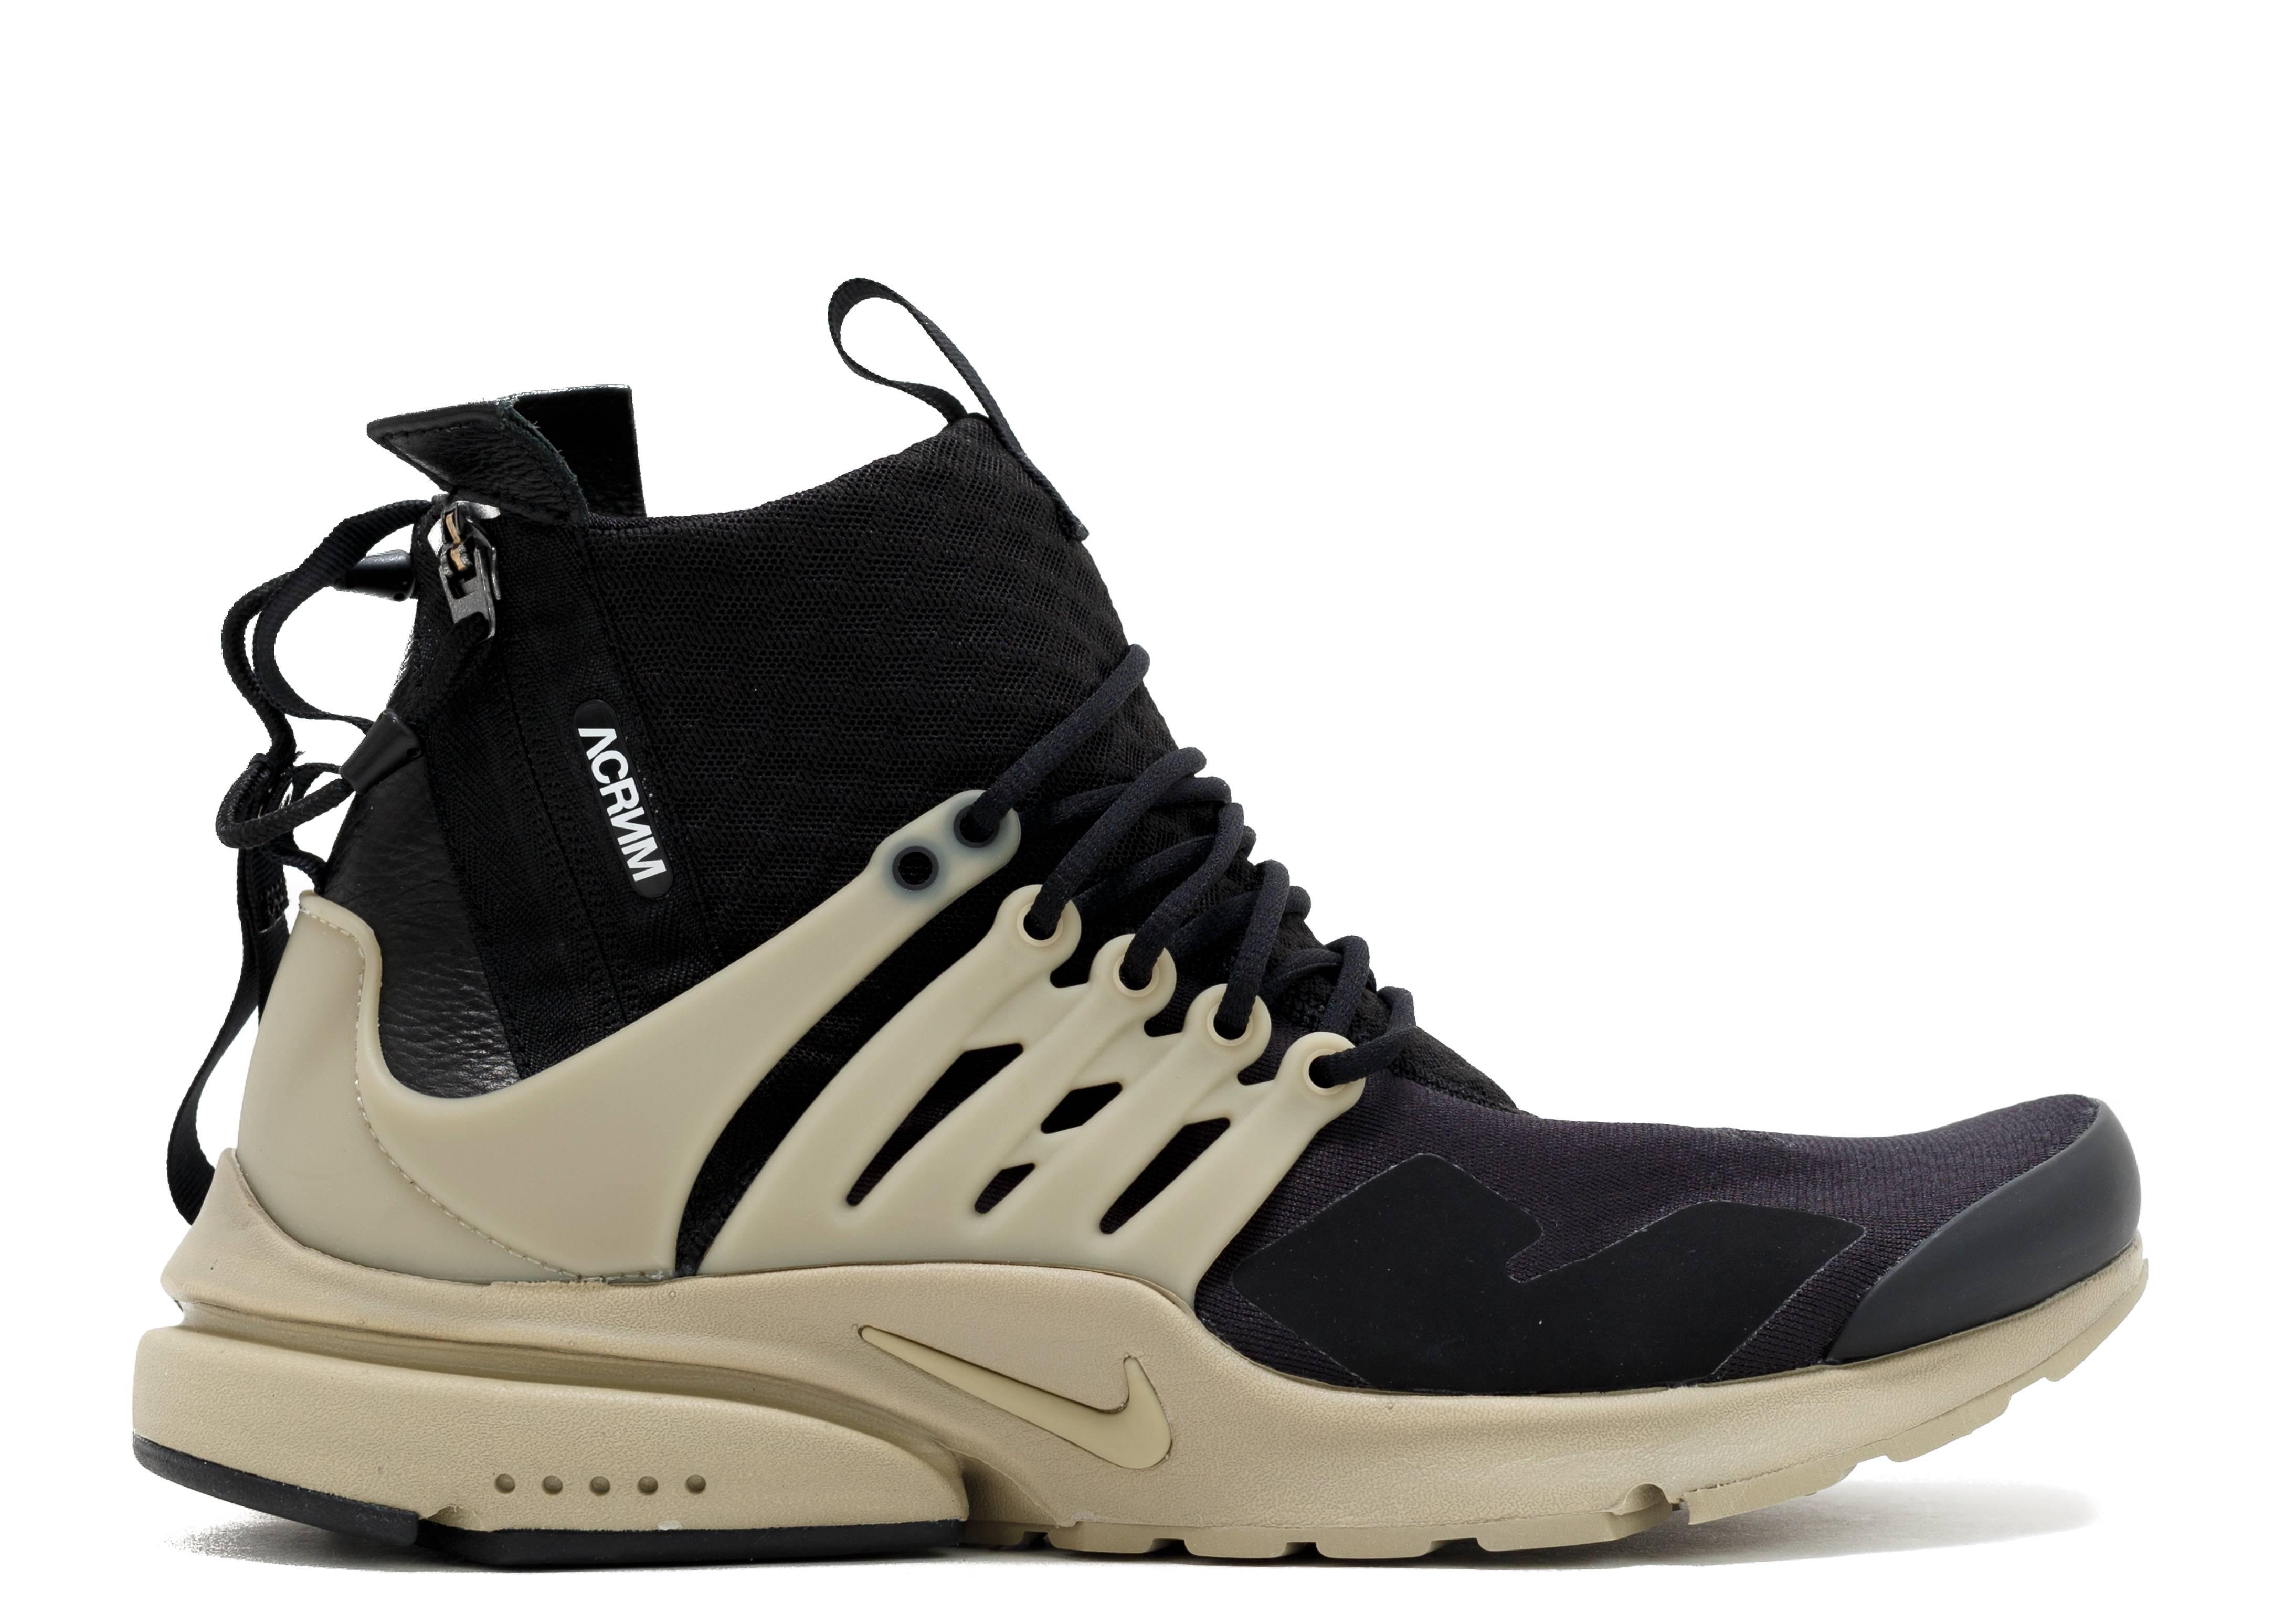 Nike Air Presto cammello